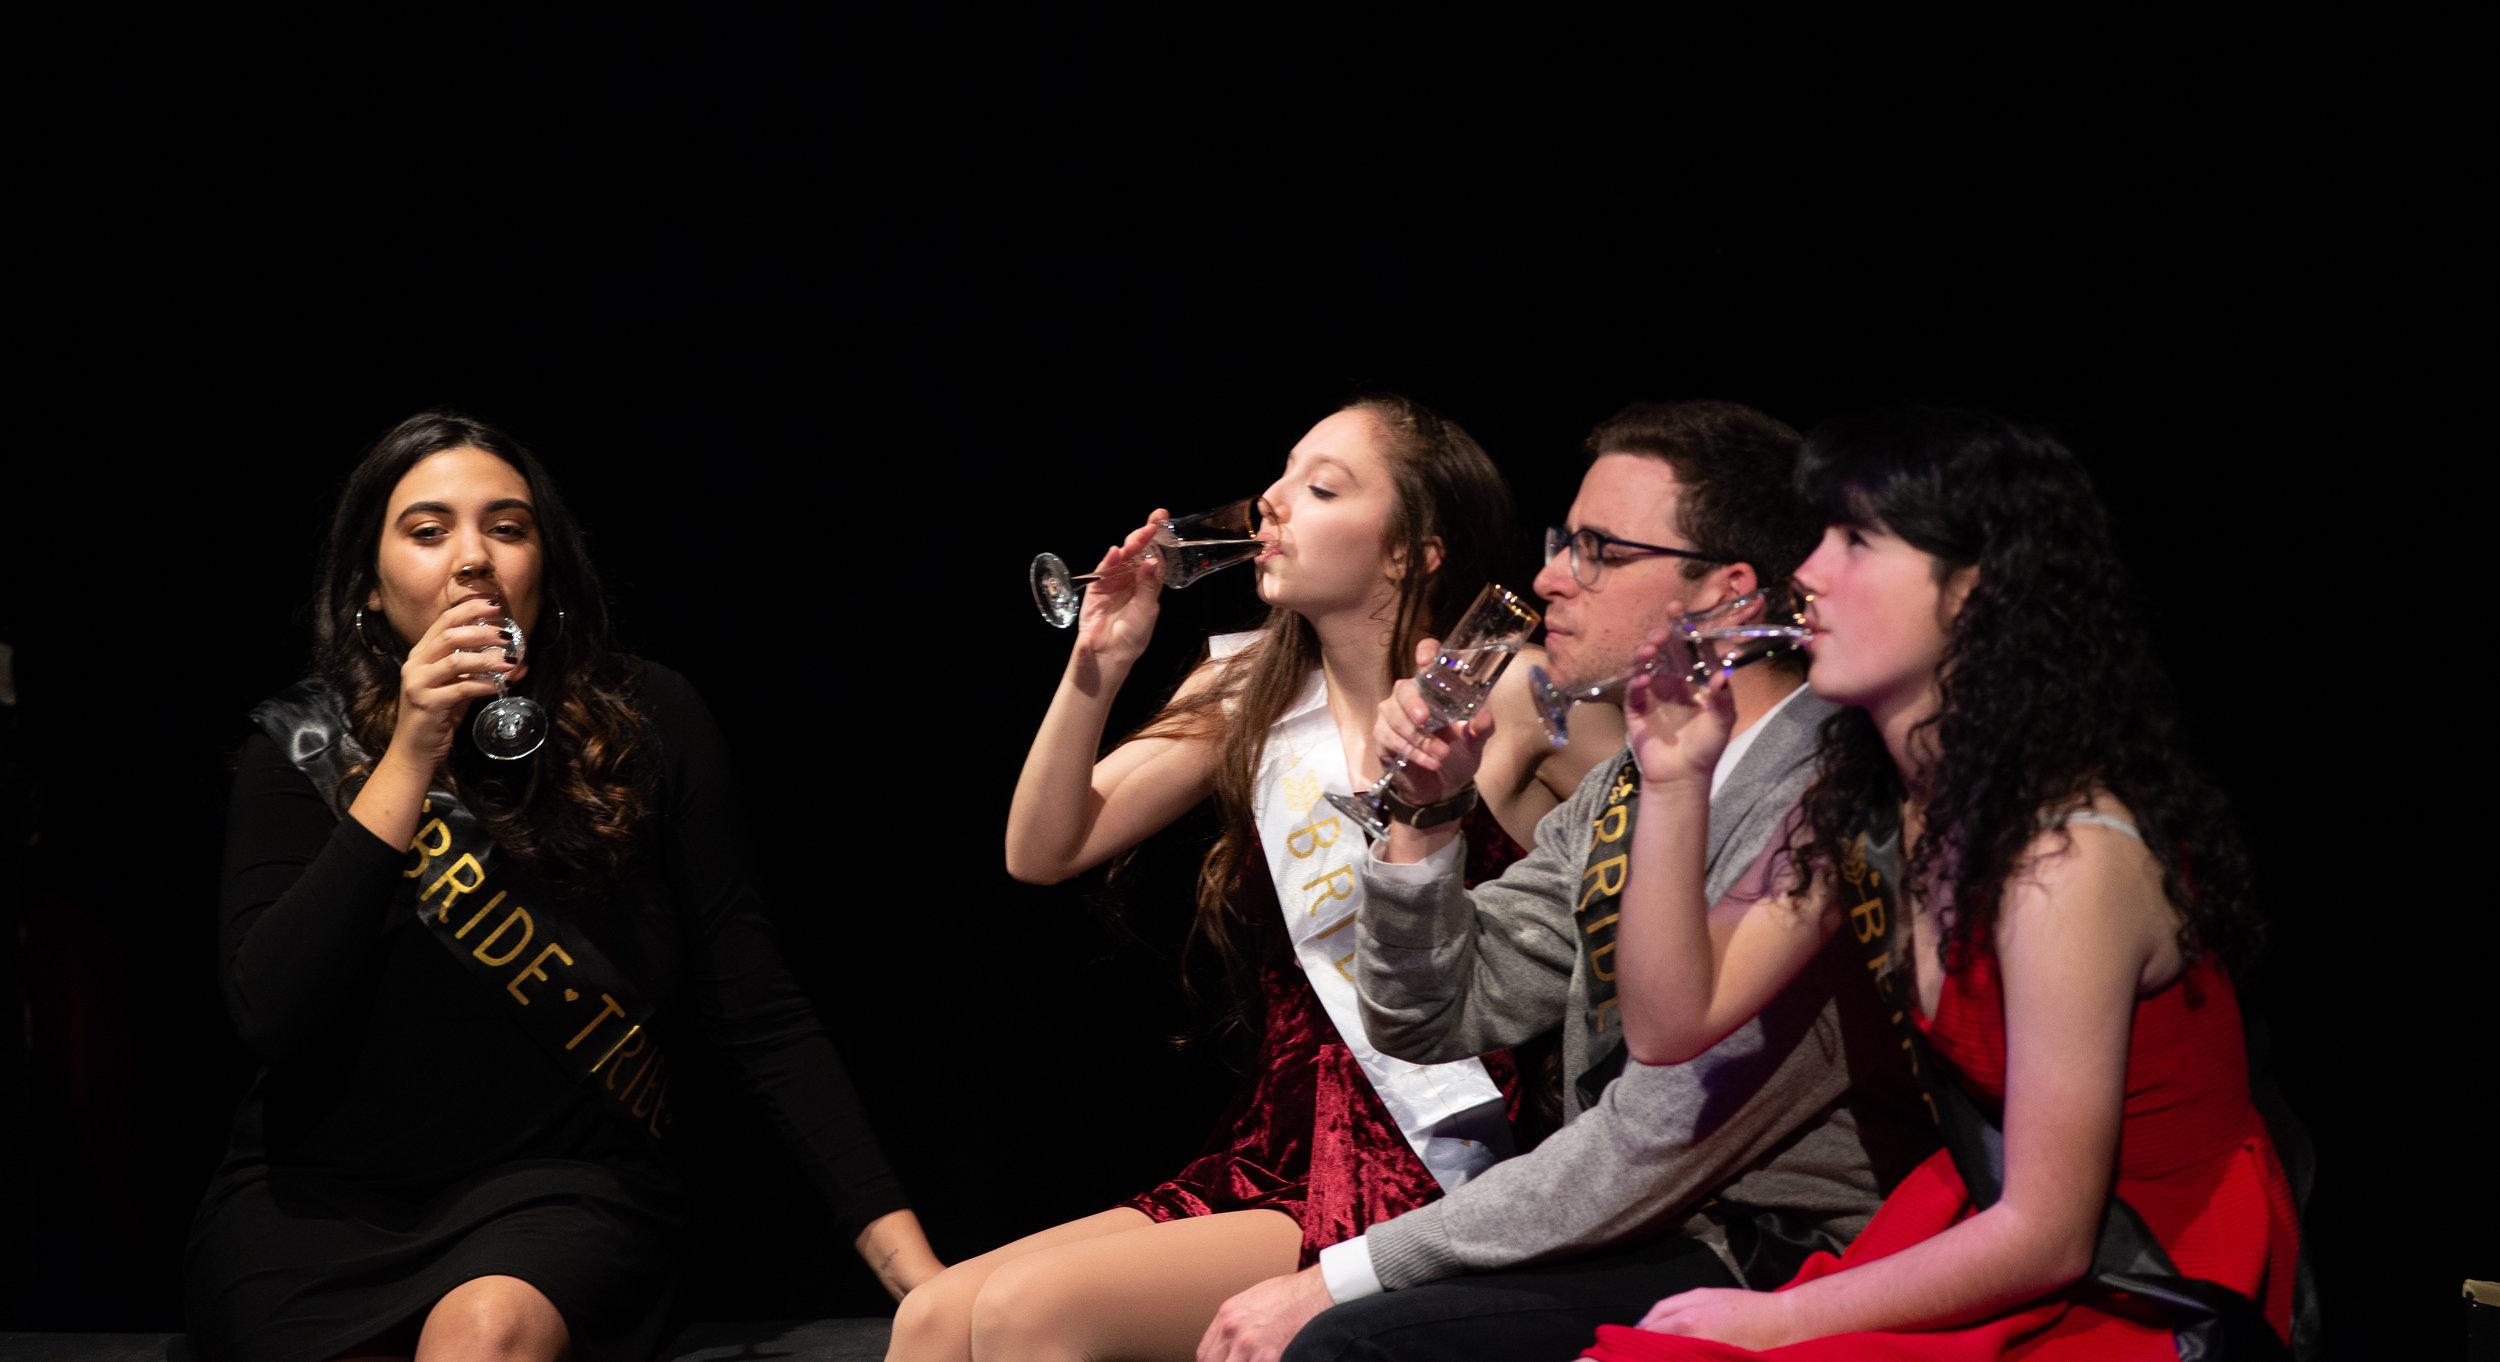 Sabrina Dunn (Vanessa), Katie Siegel (Kiki), John Lerman (Jordan), Steph Bradli (Laura)